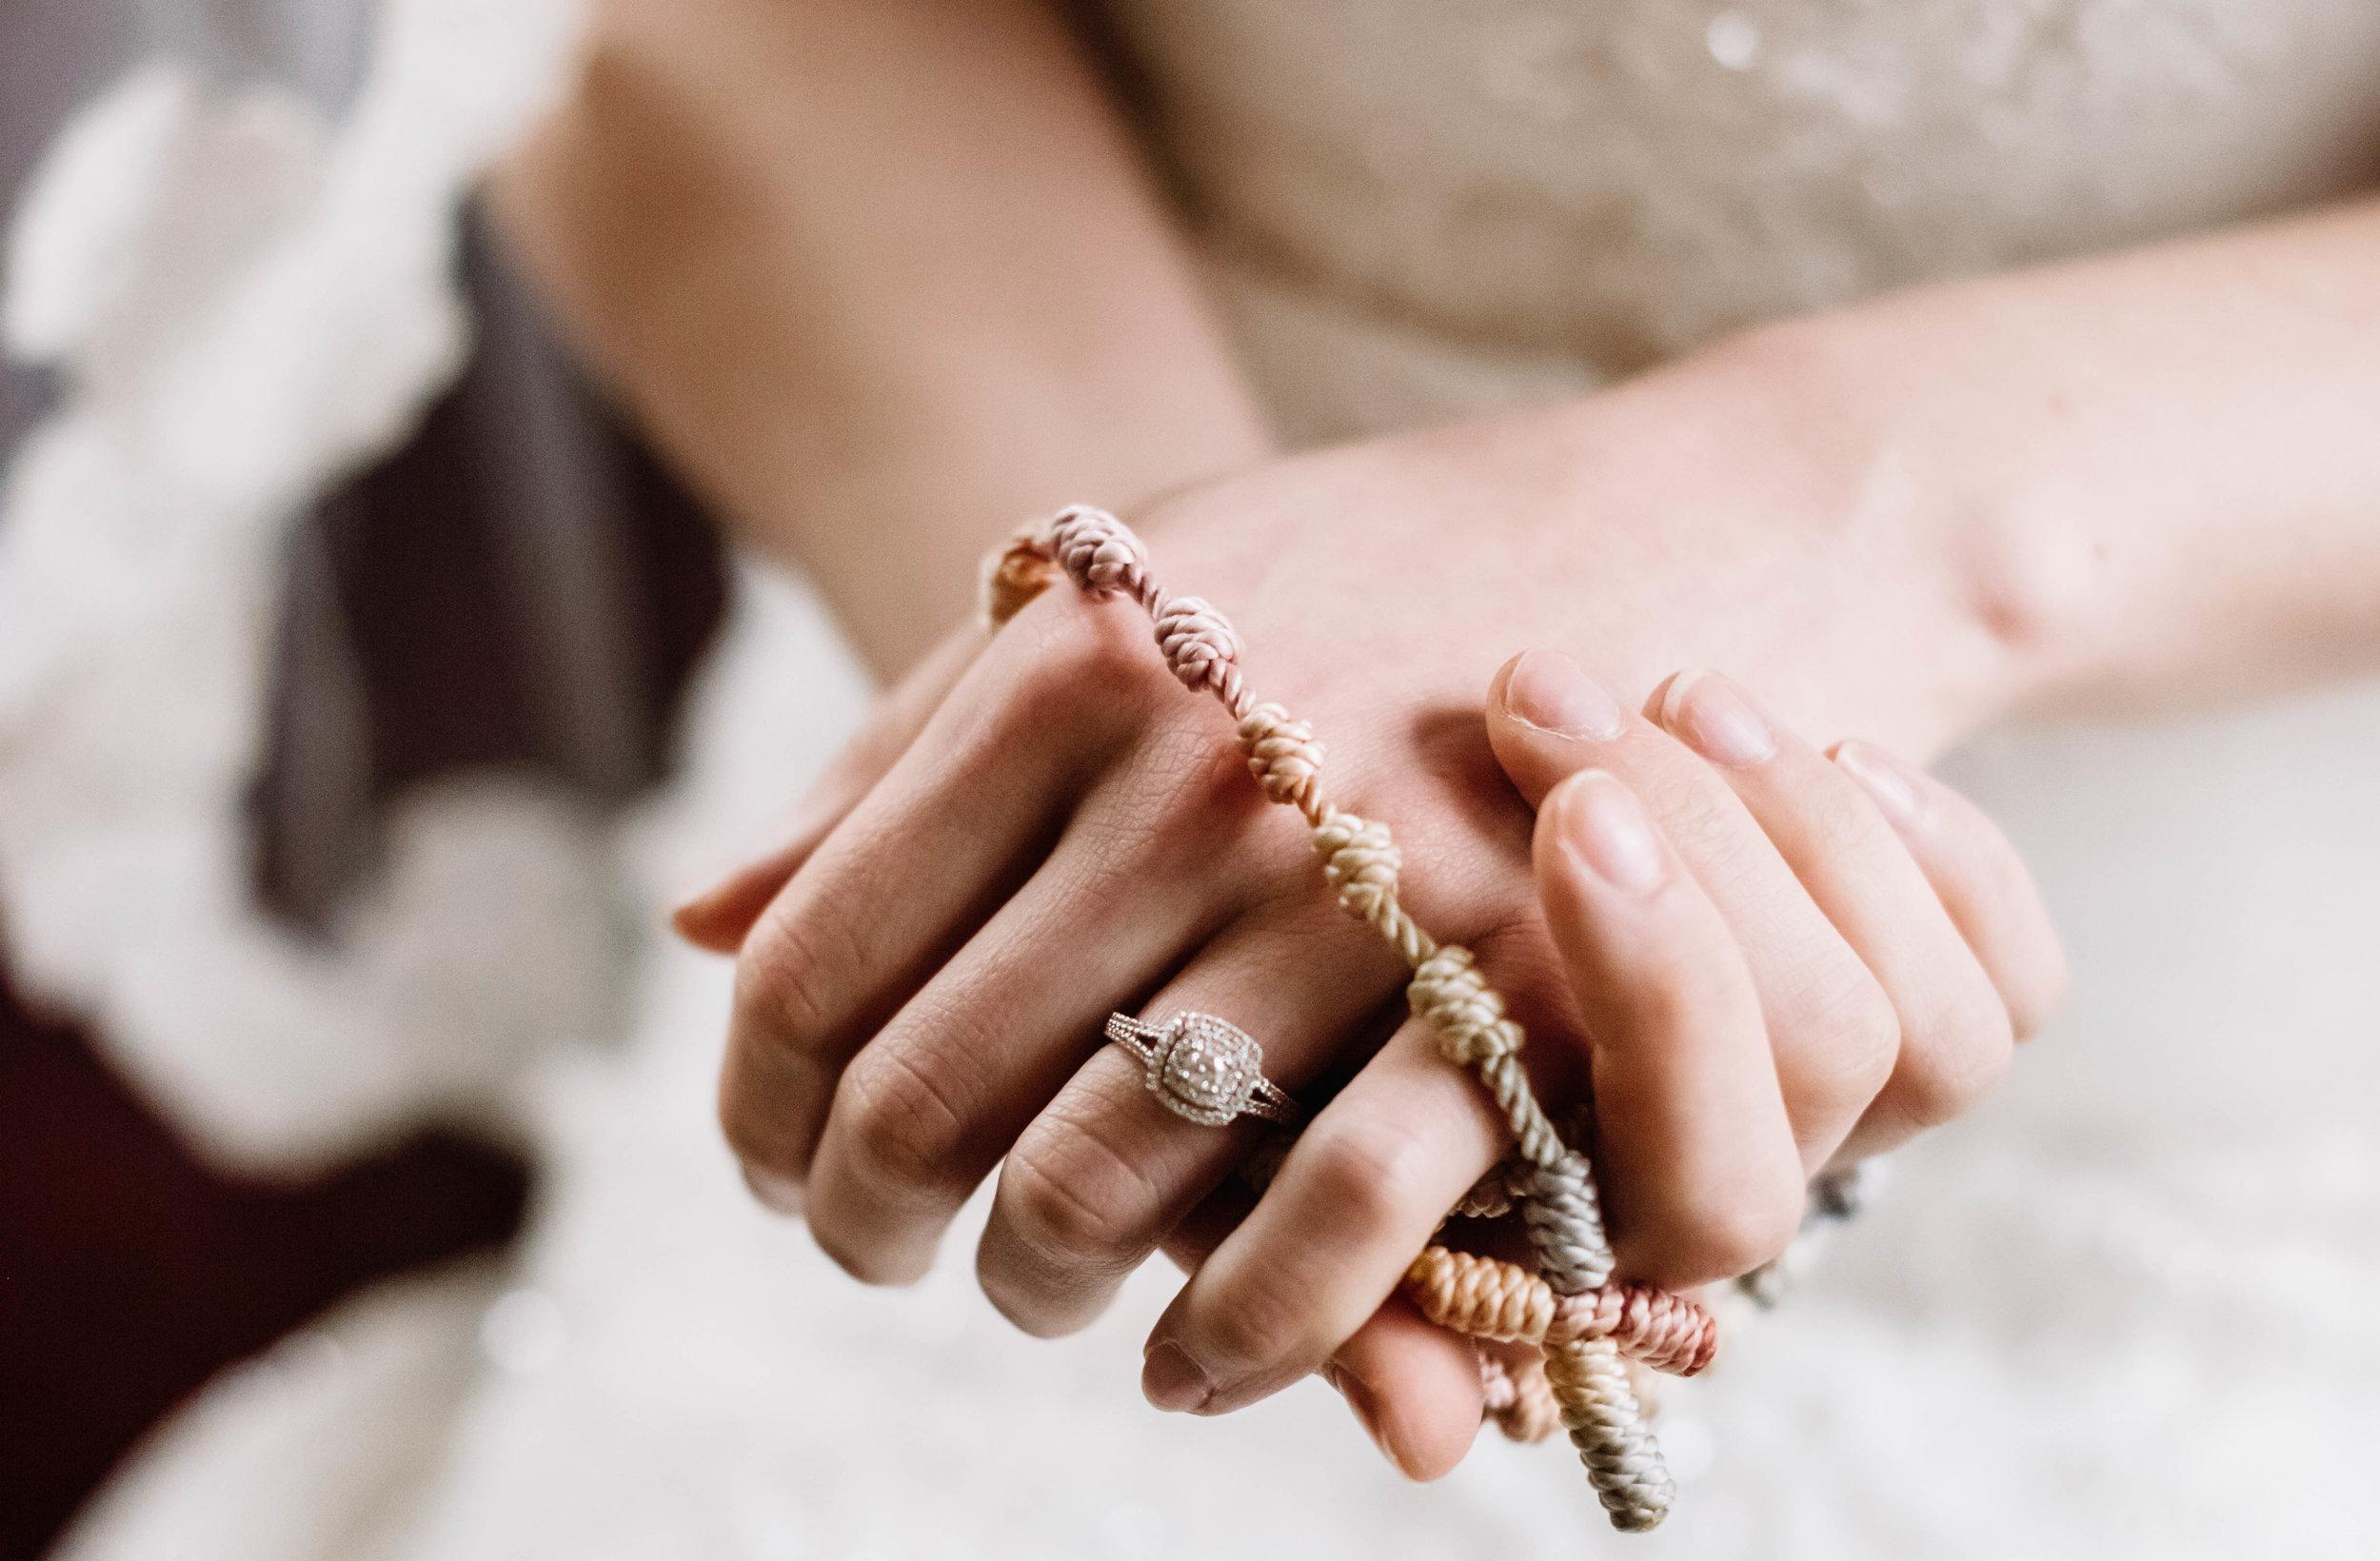 Bride holding rosary wearing wedding ring